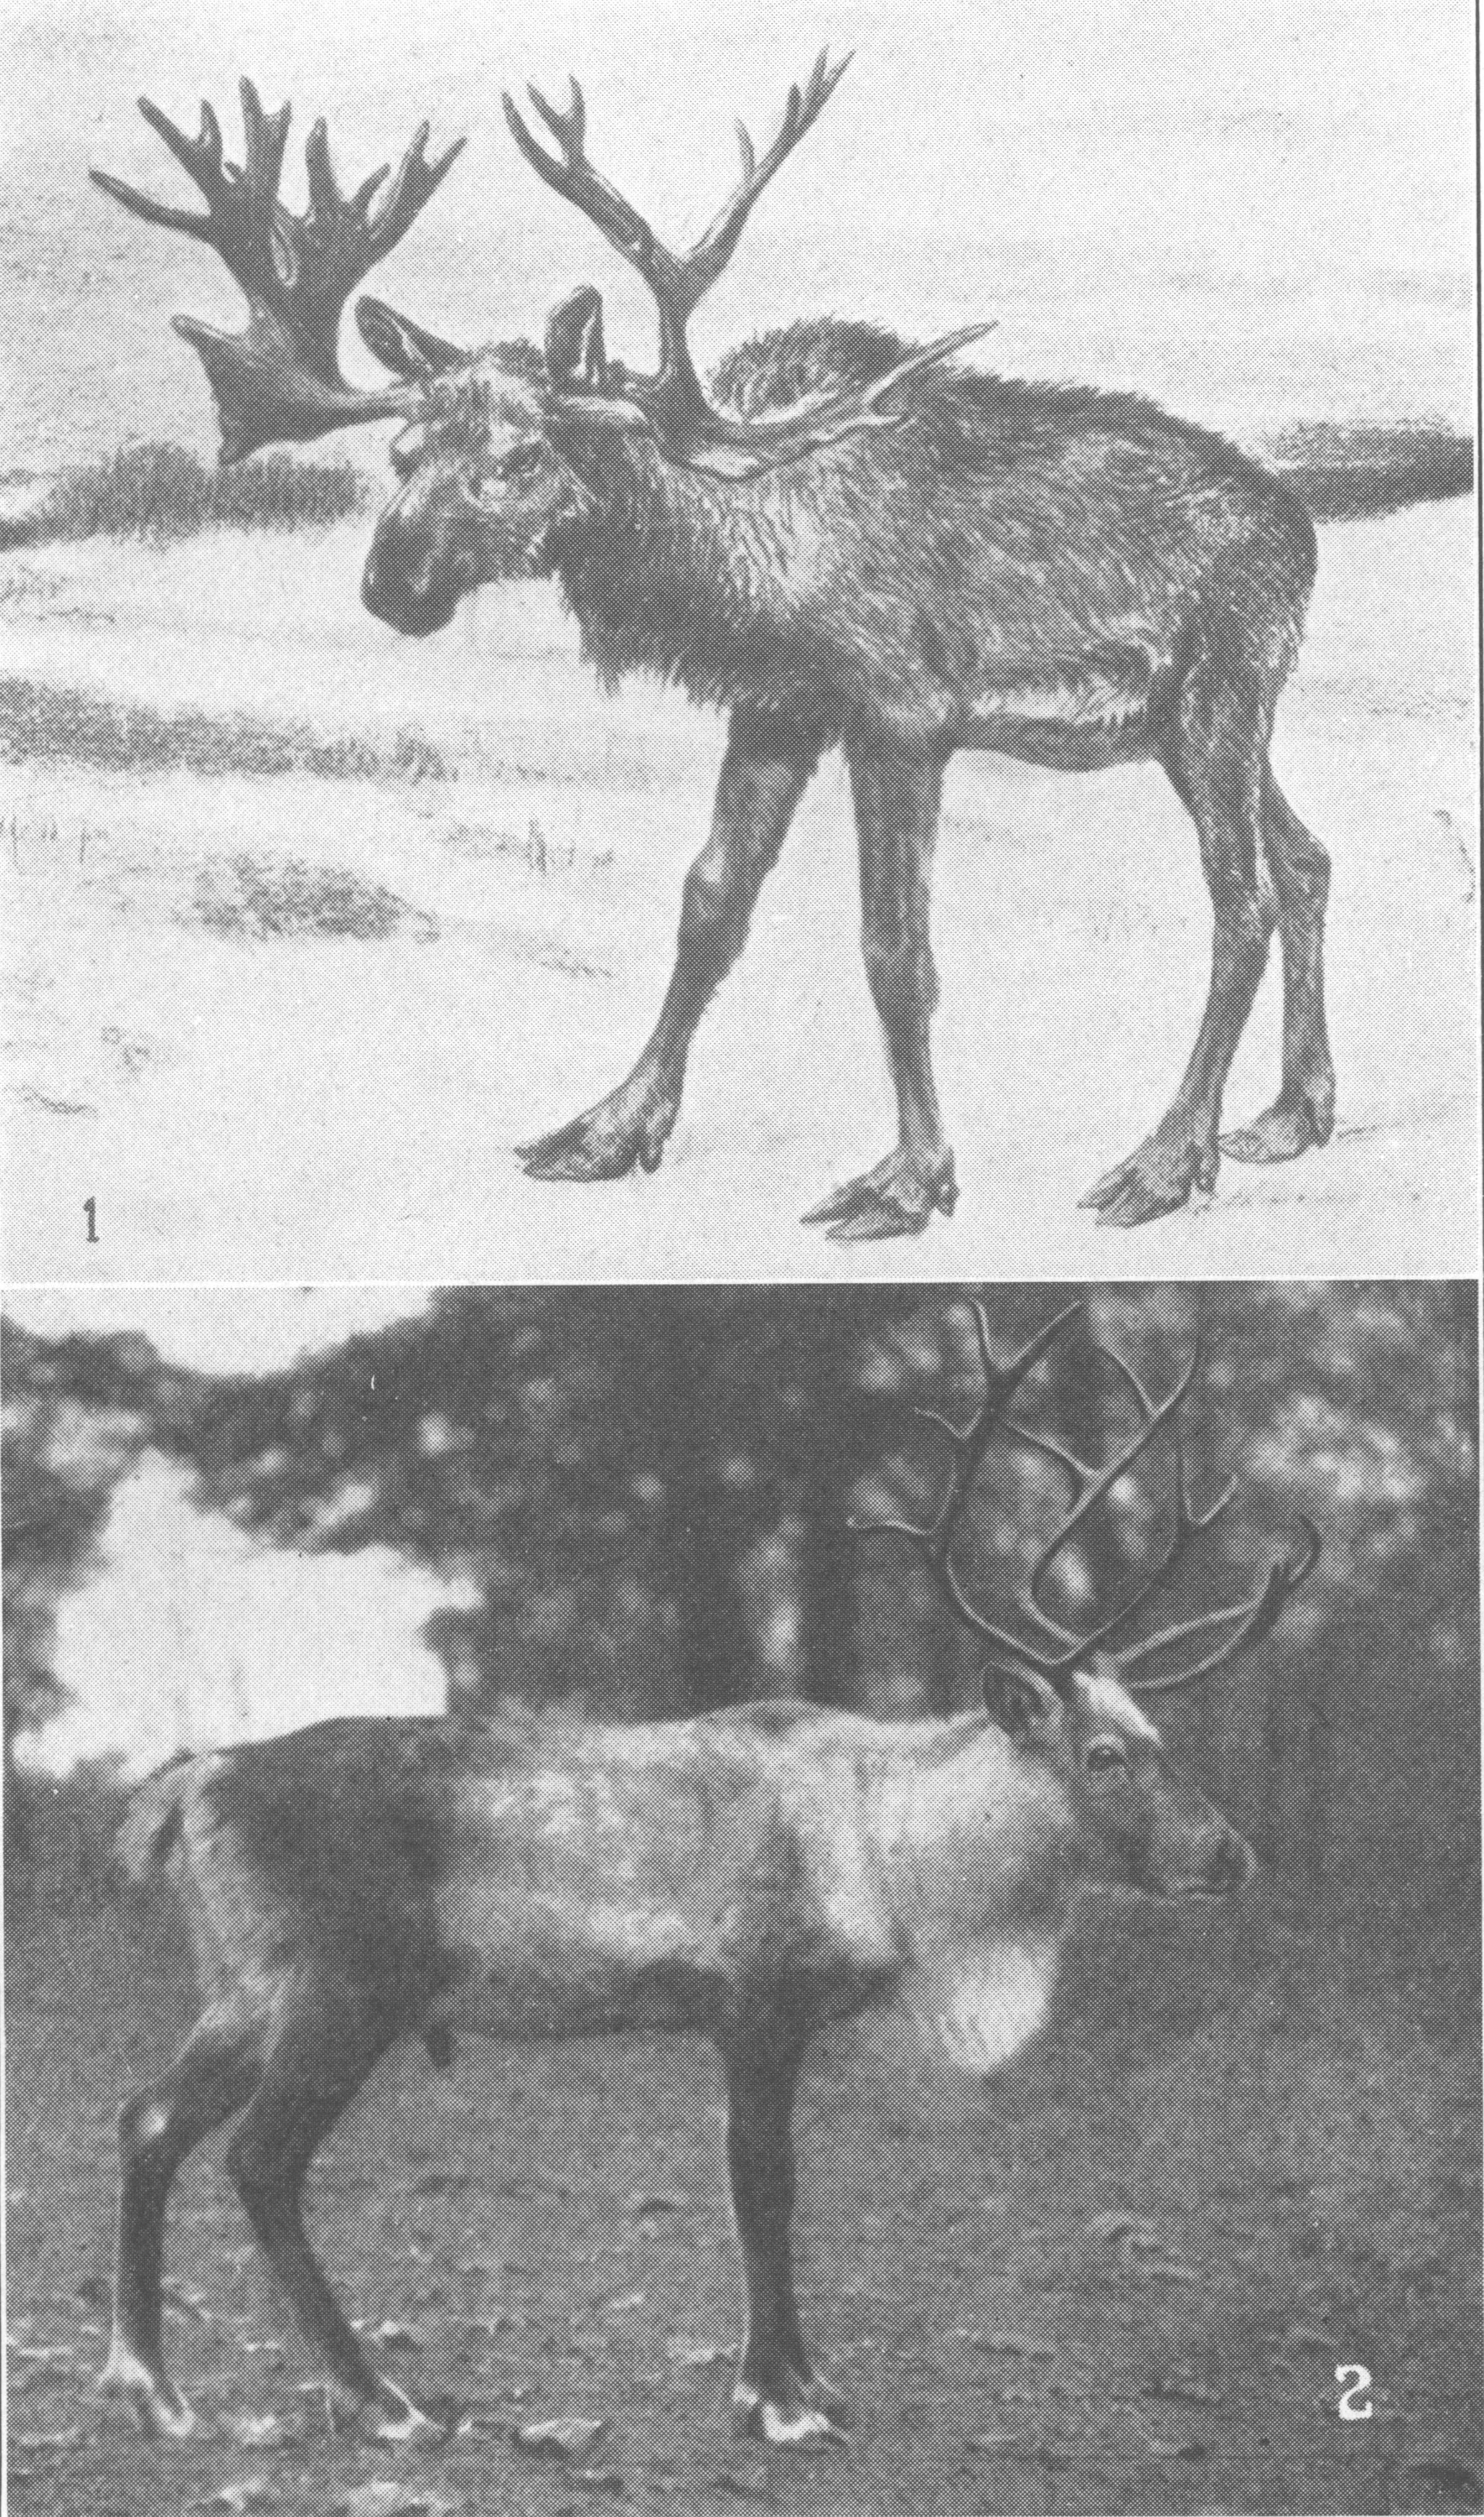 paleontology of kentucky by w r jillson 1931 chapter ten